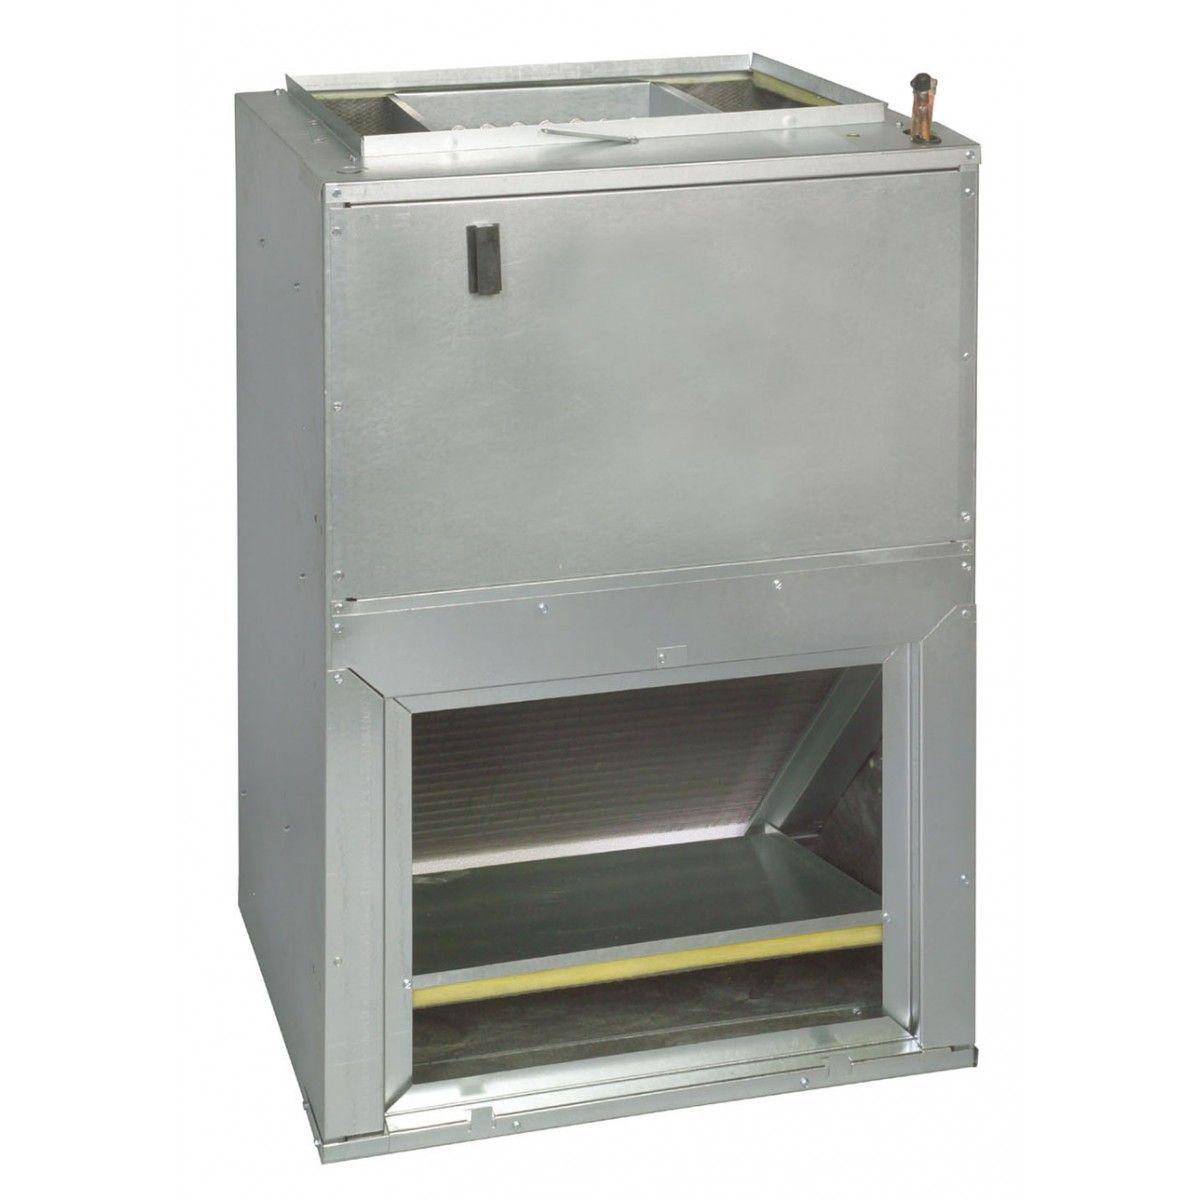 goodman awuf air handler wiring diagram honeywell rth2300 thermostat 2 5 ton wall mount in 3